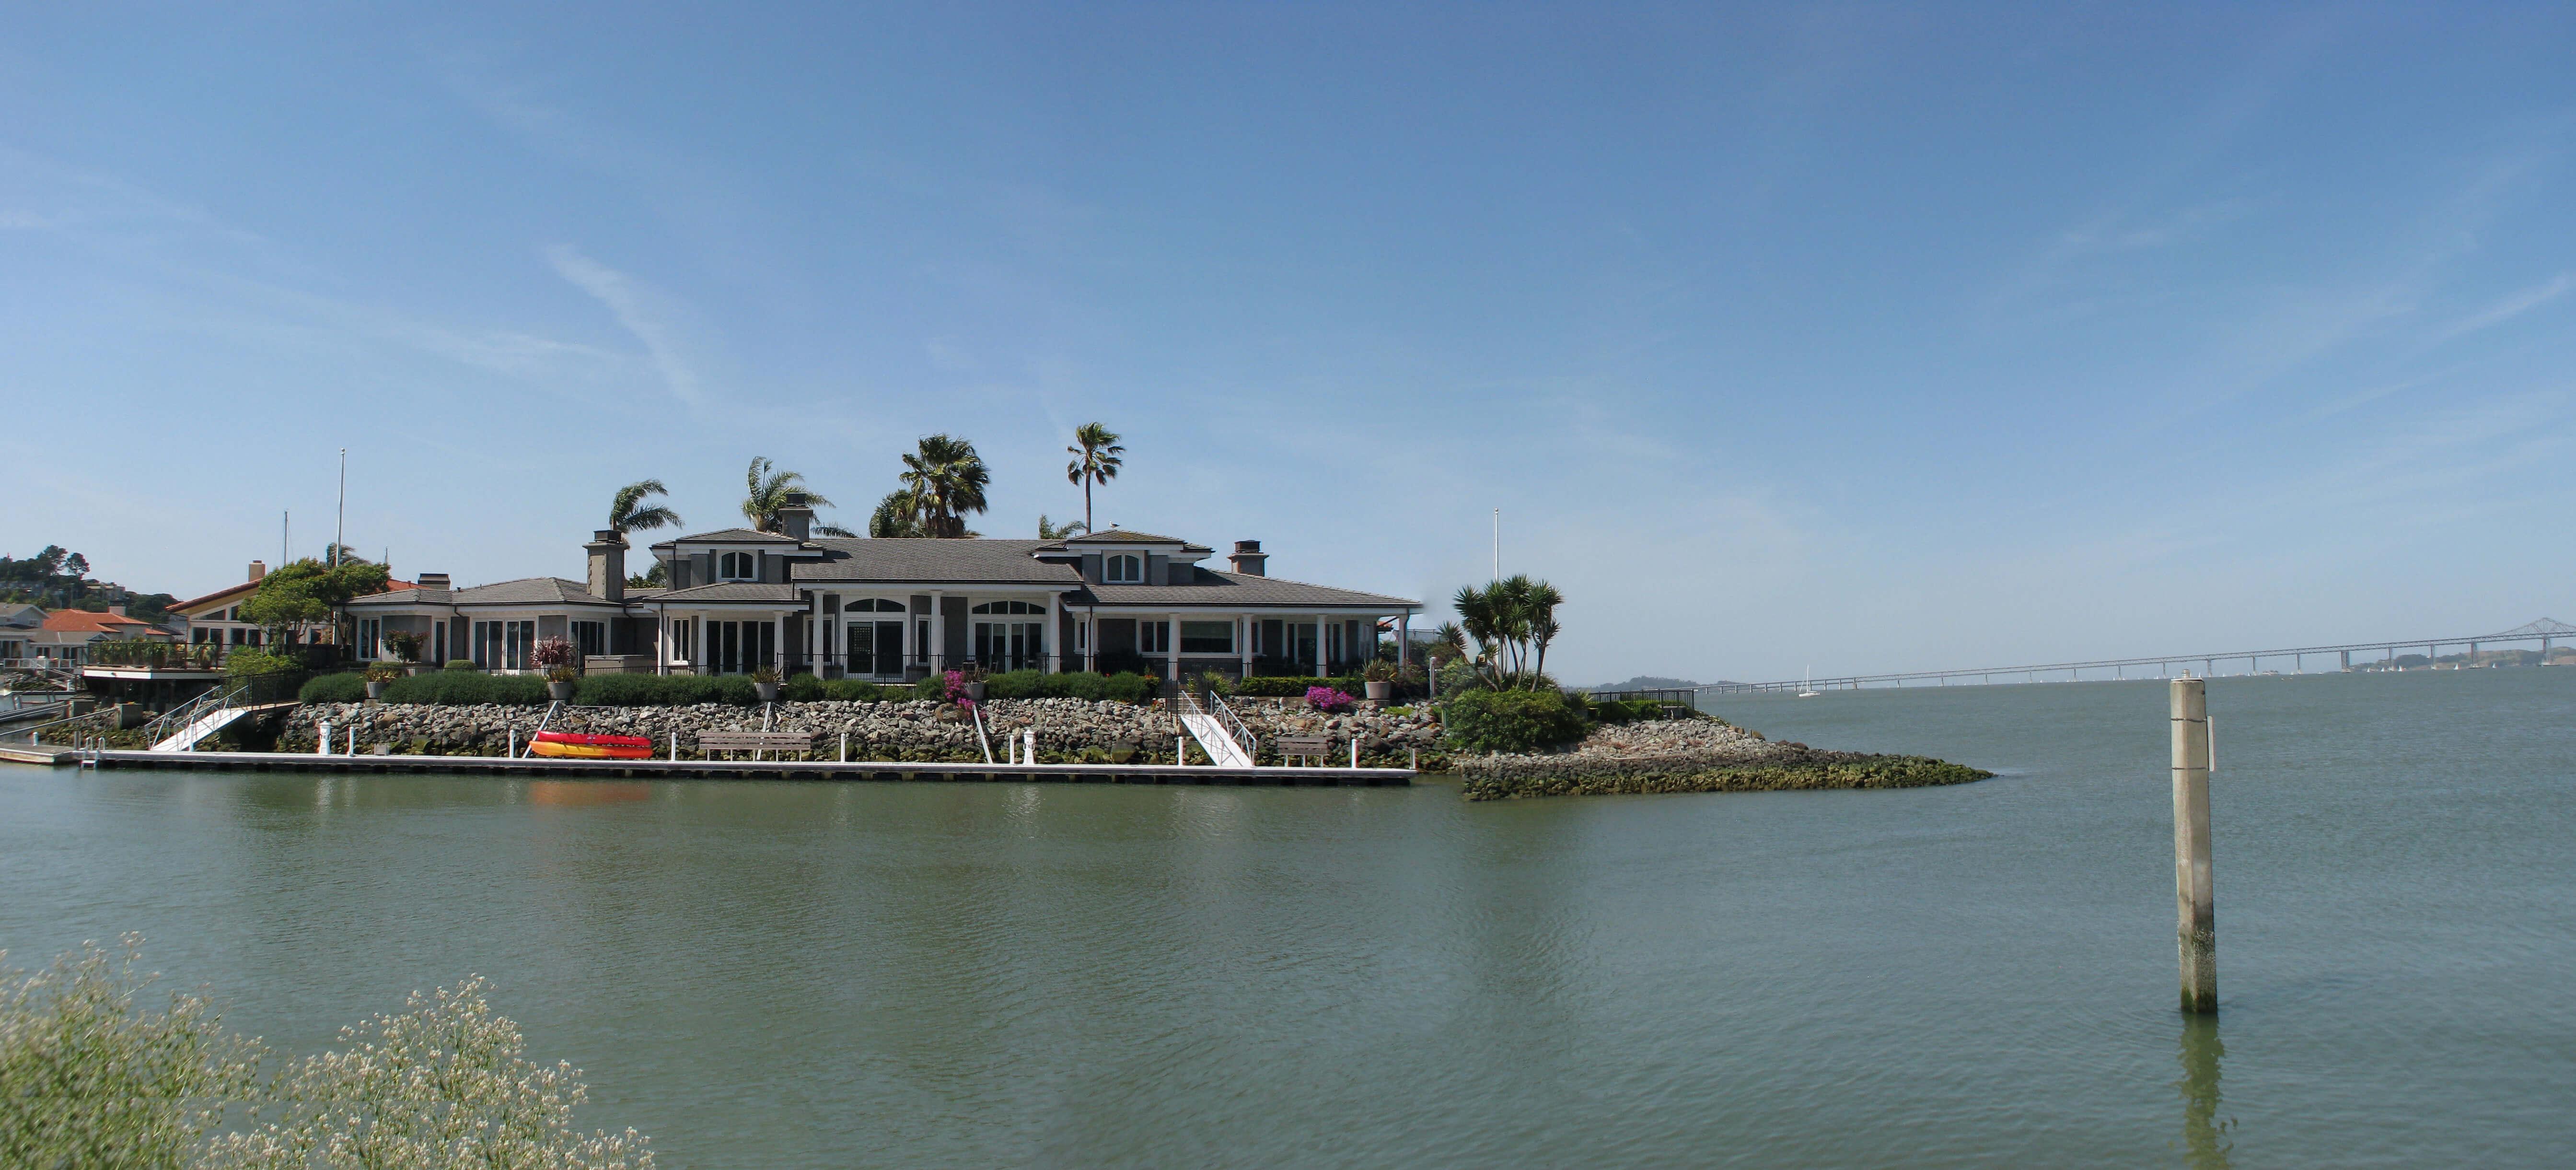 Home at Paradise Cay, Tiburon CA